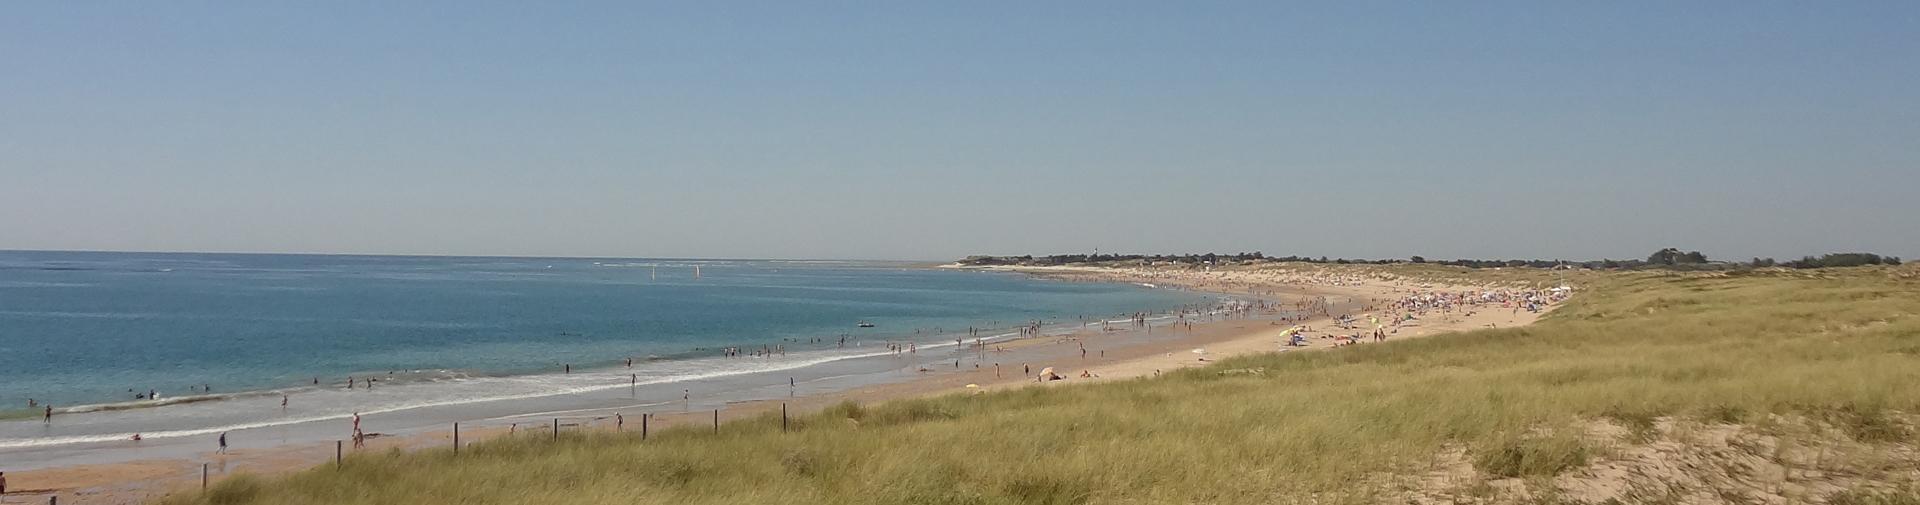 la-plage-camping-ile-oleron-campiere